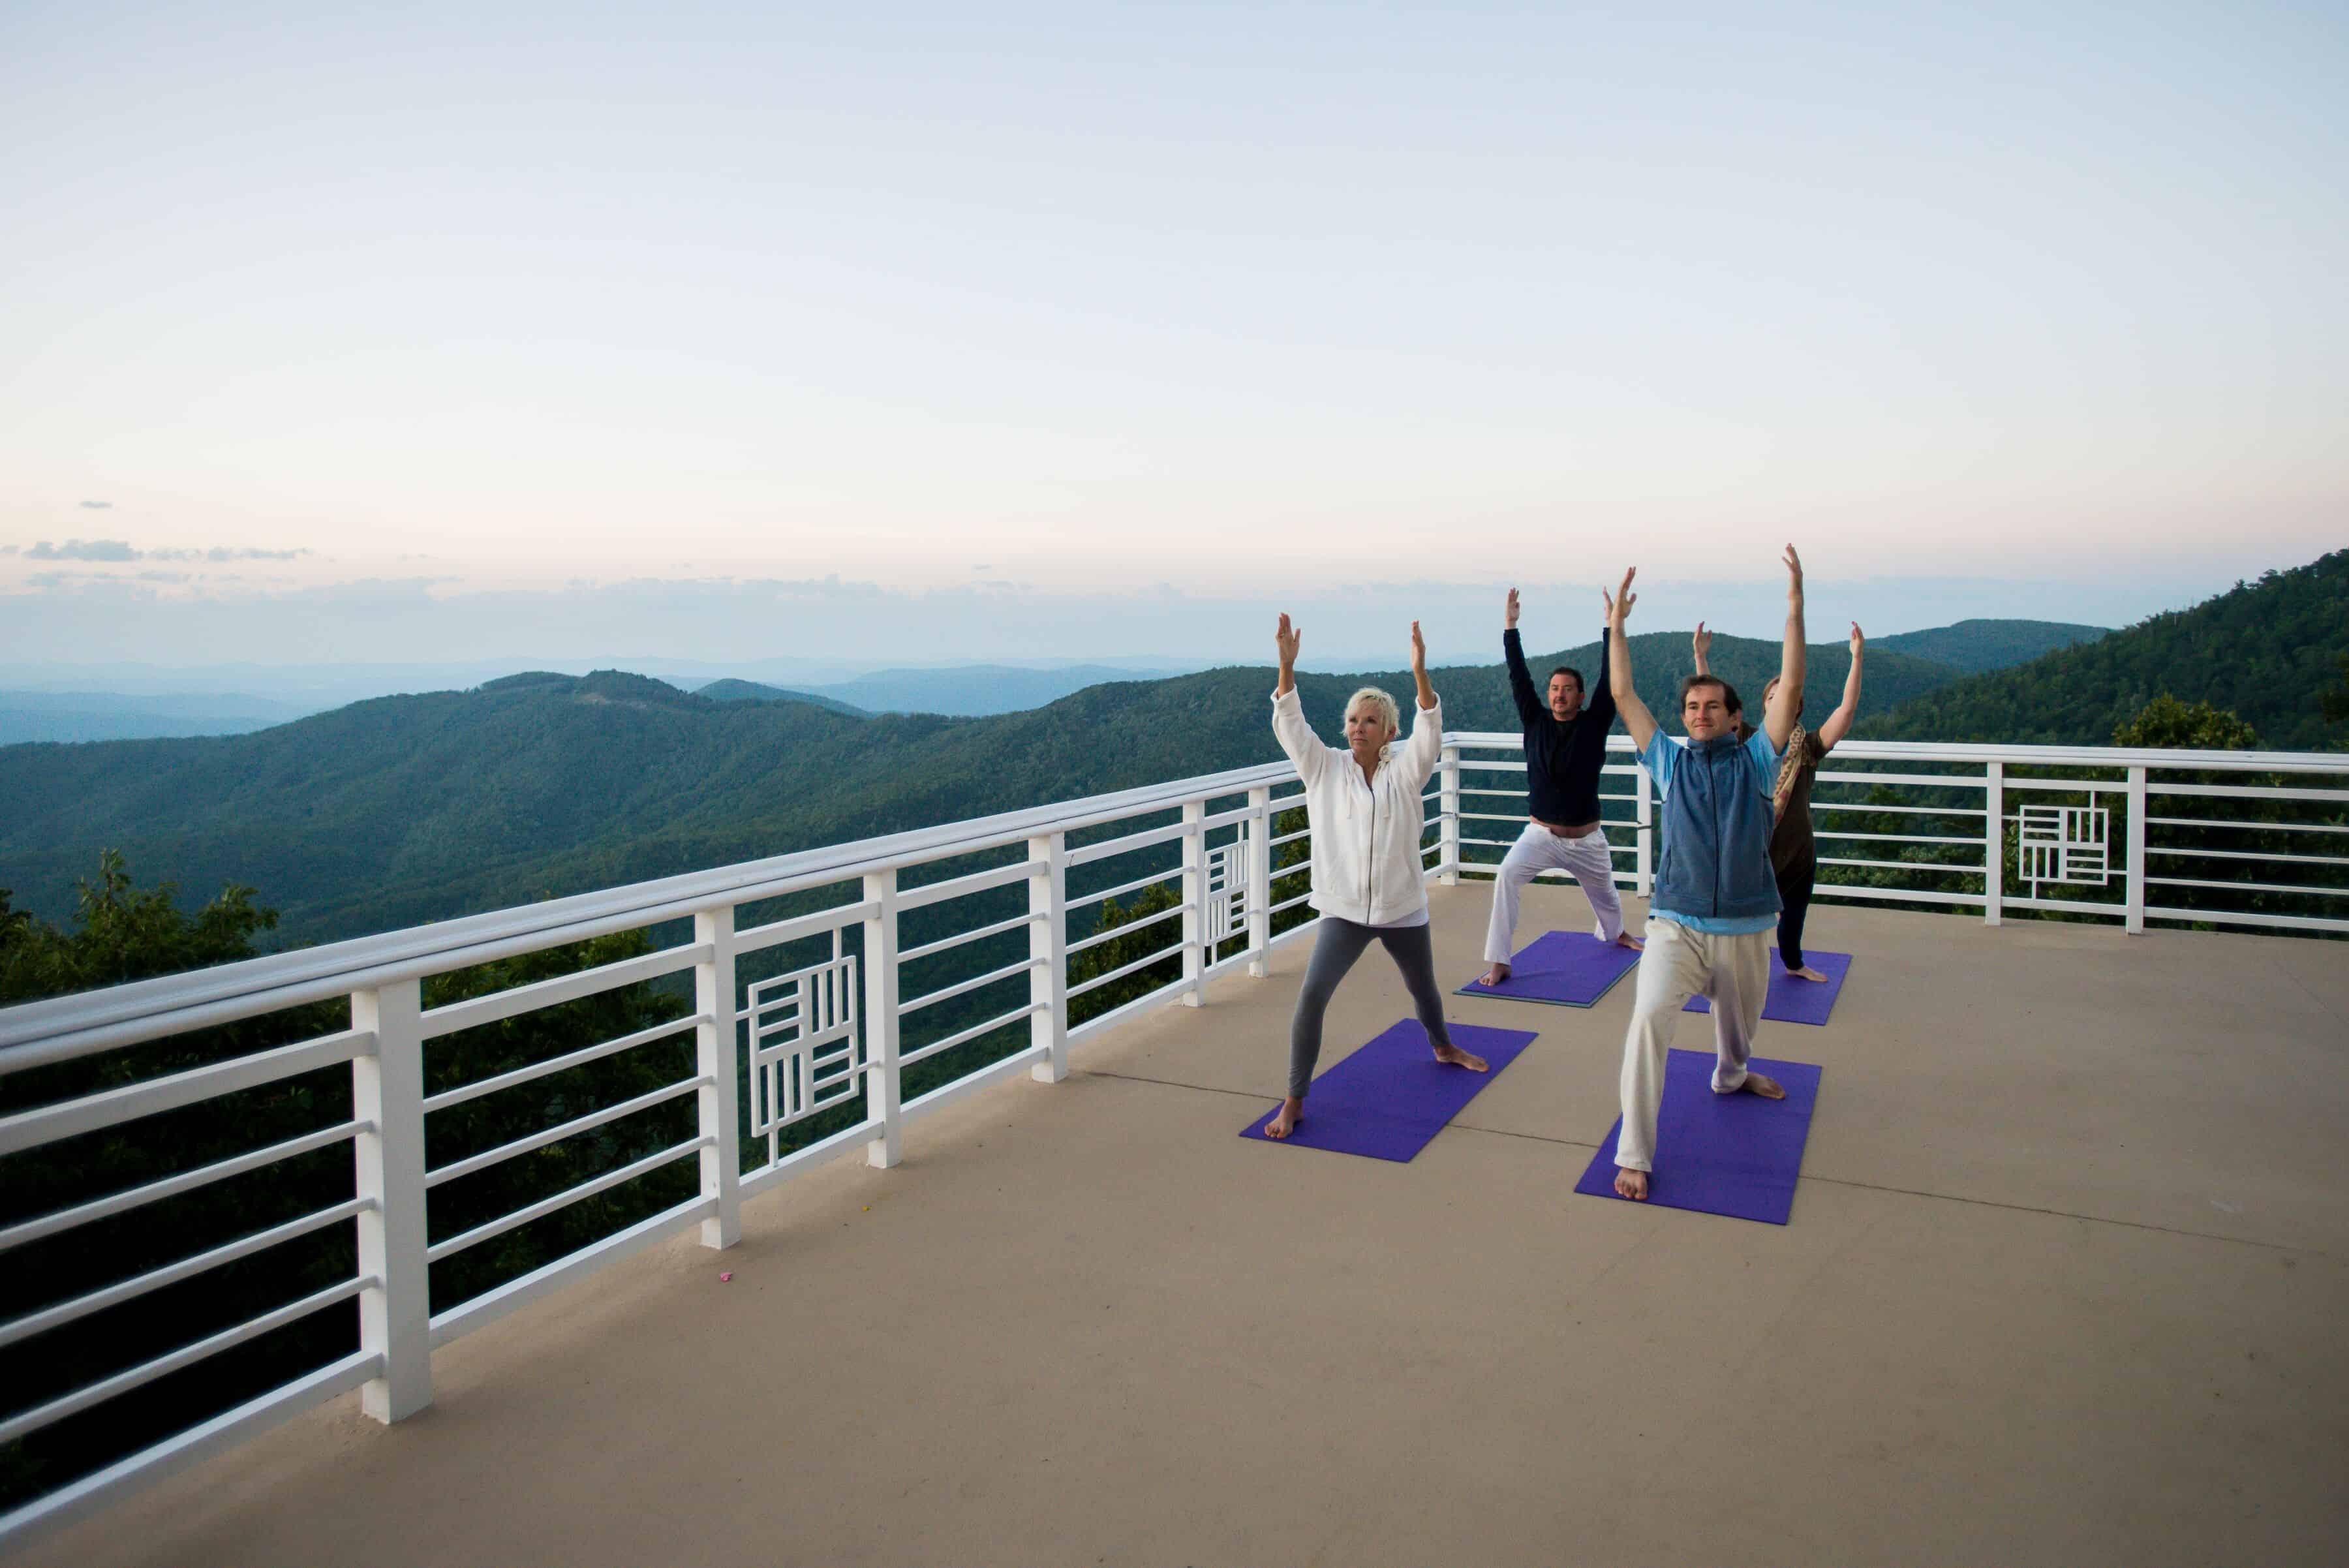 Art of Living Balcony Yoga